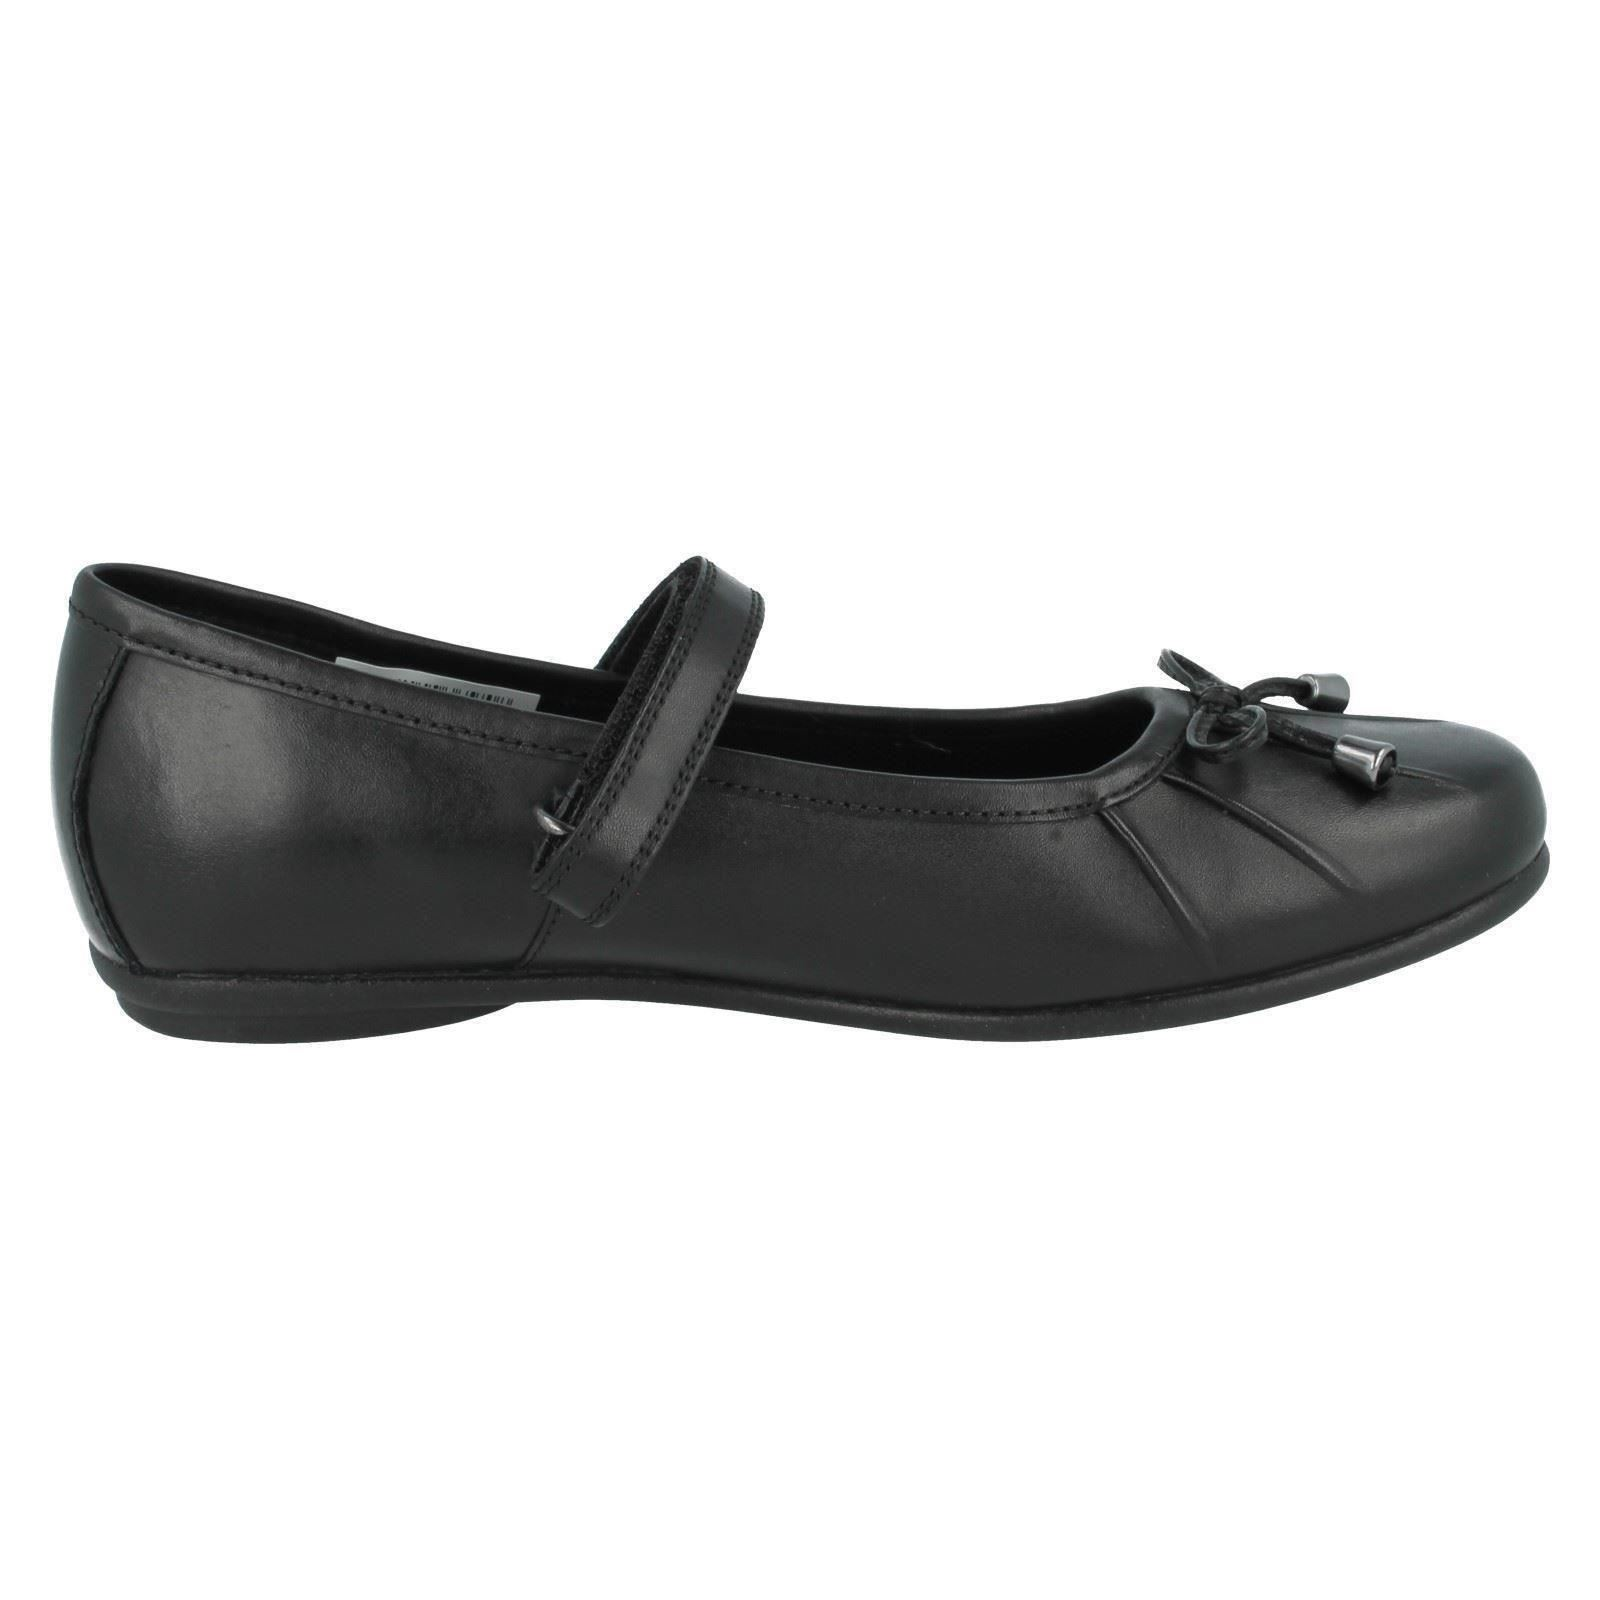 Girls Clarks Shoes Style - Tasha Abby